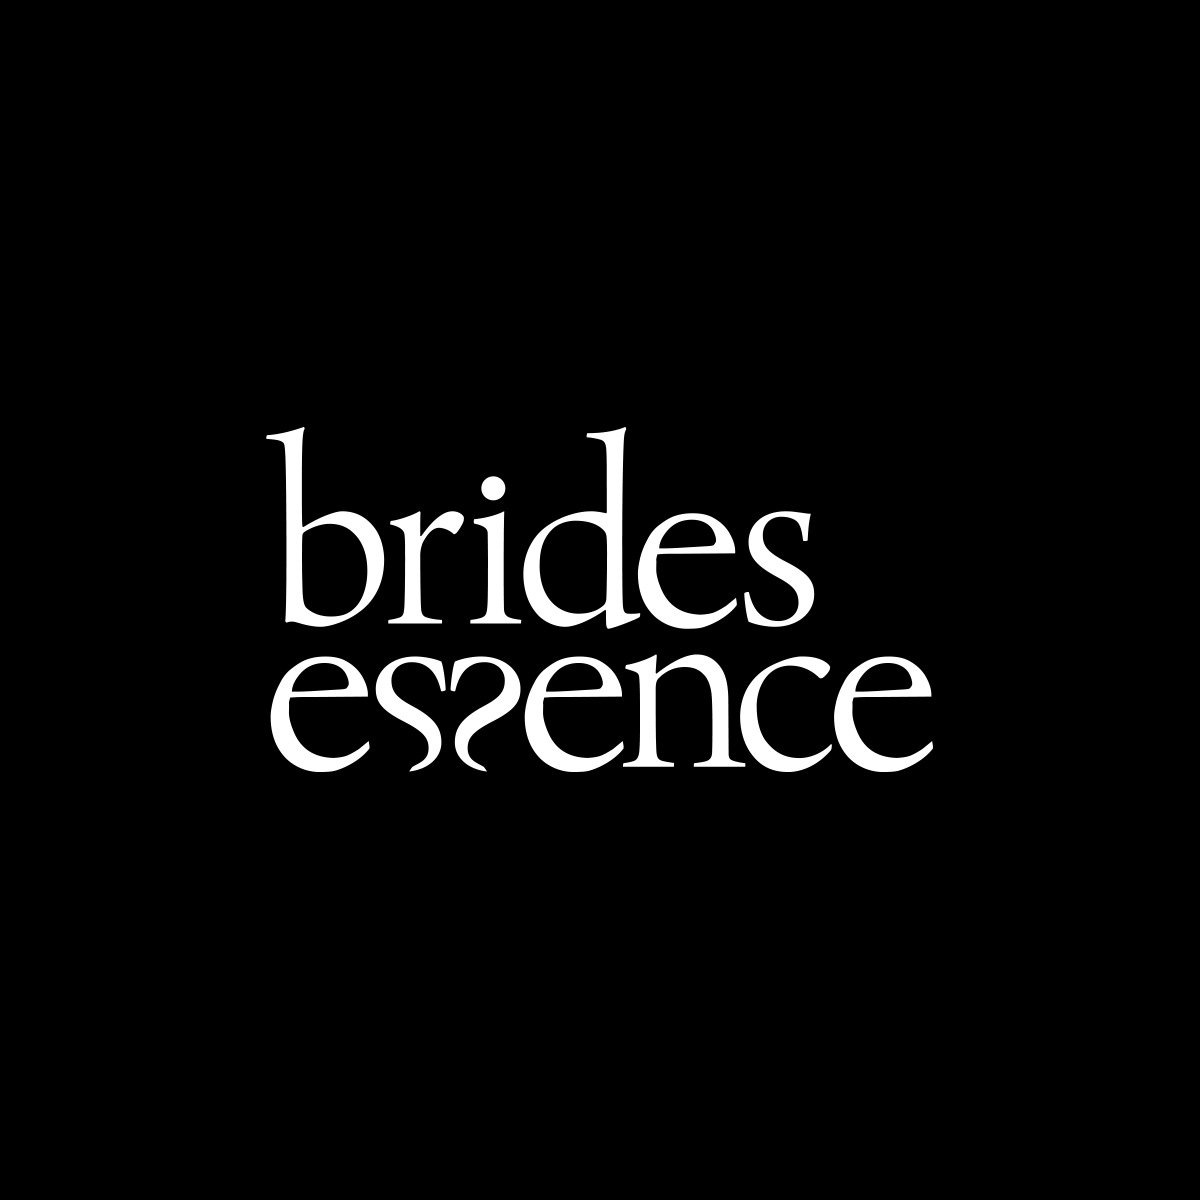 Brides Essence Masthead